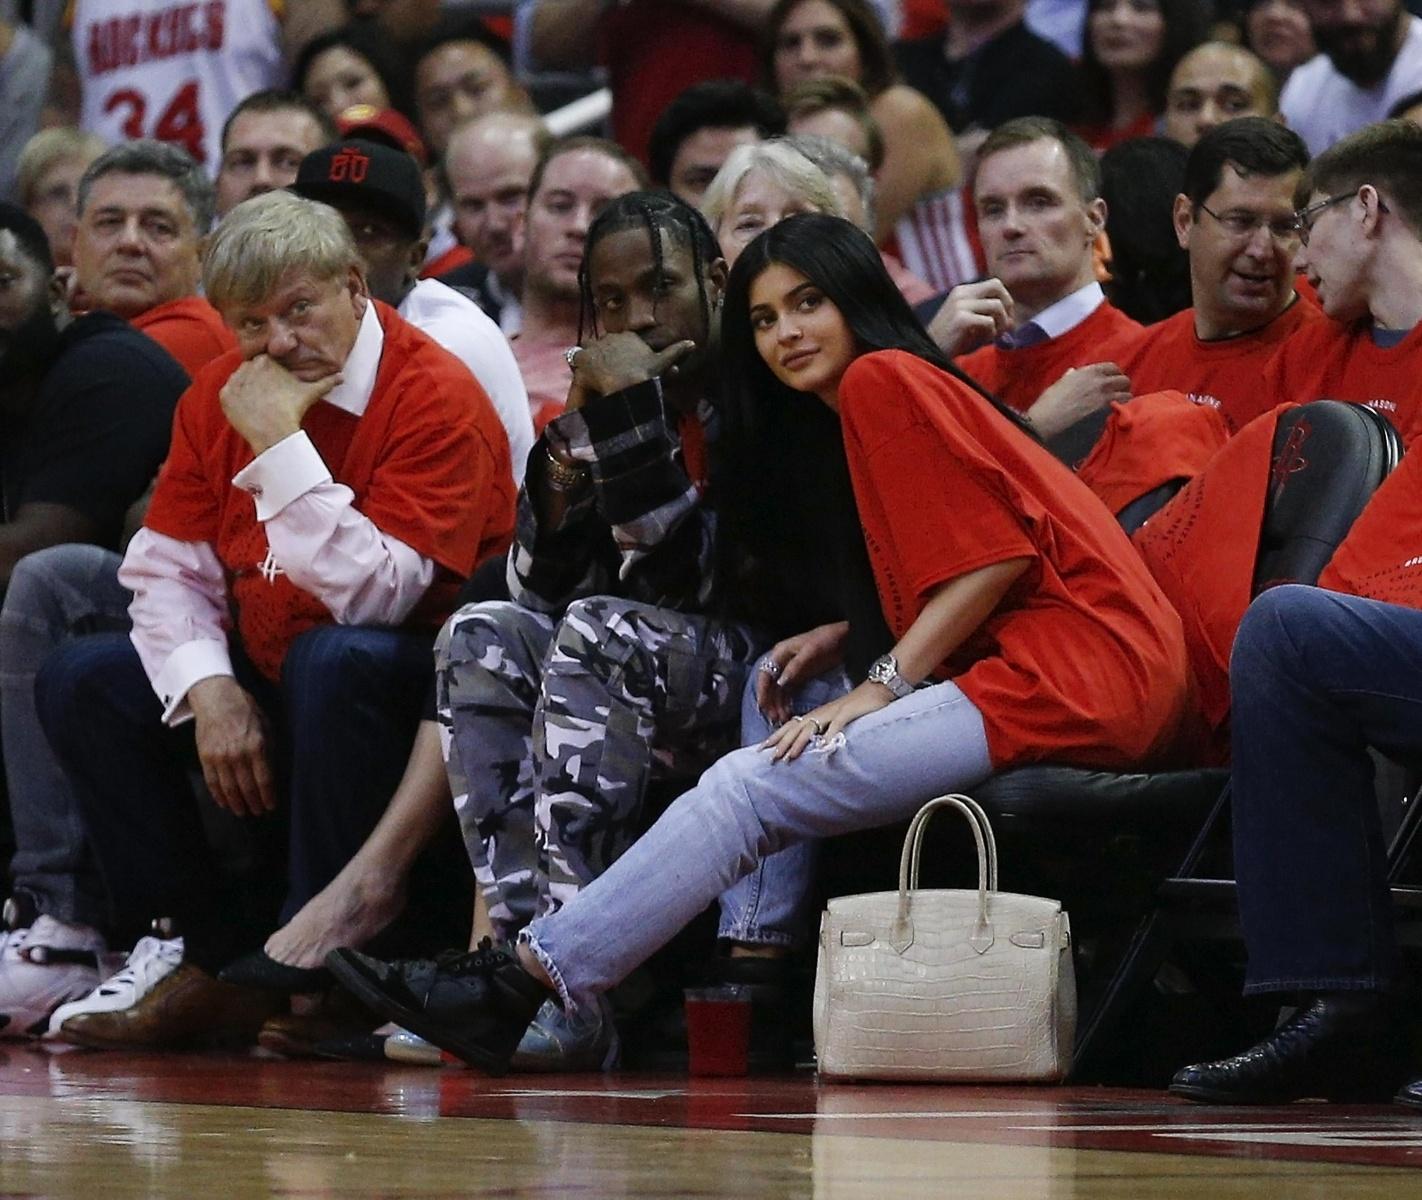 Kylie Jenner uses Fendi stroller for walk with daughter